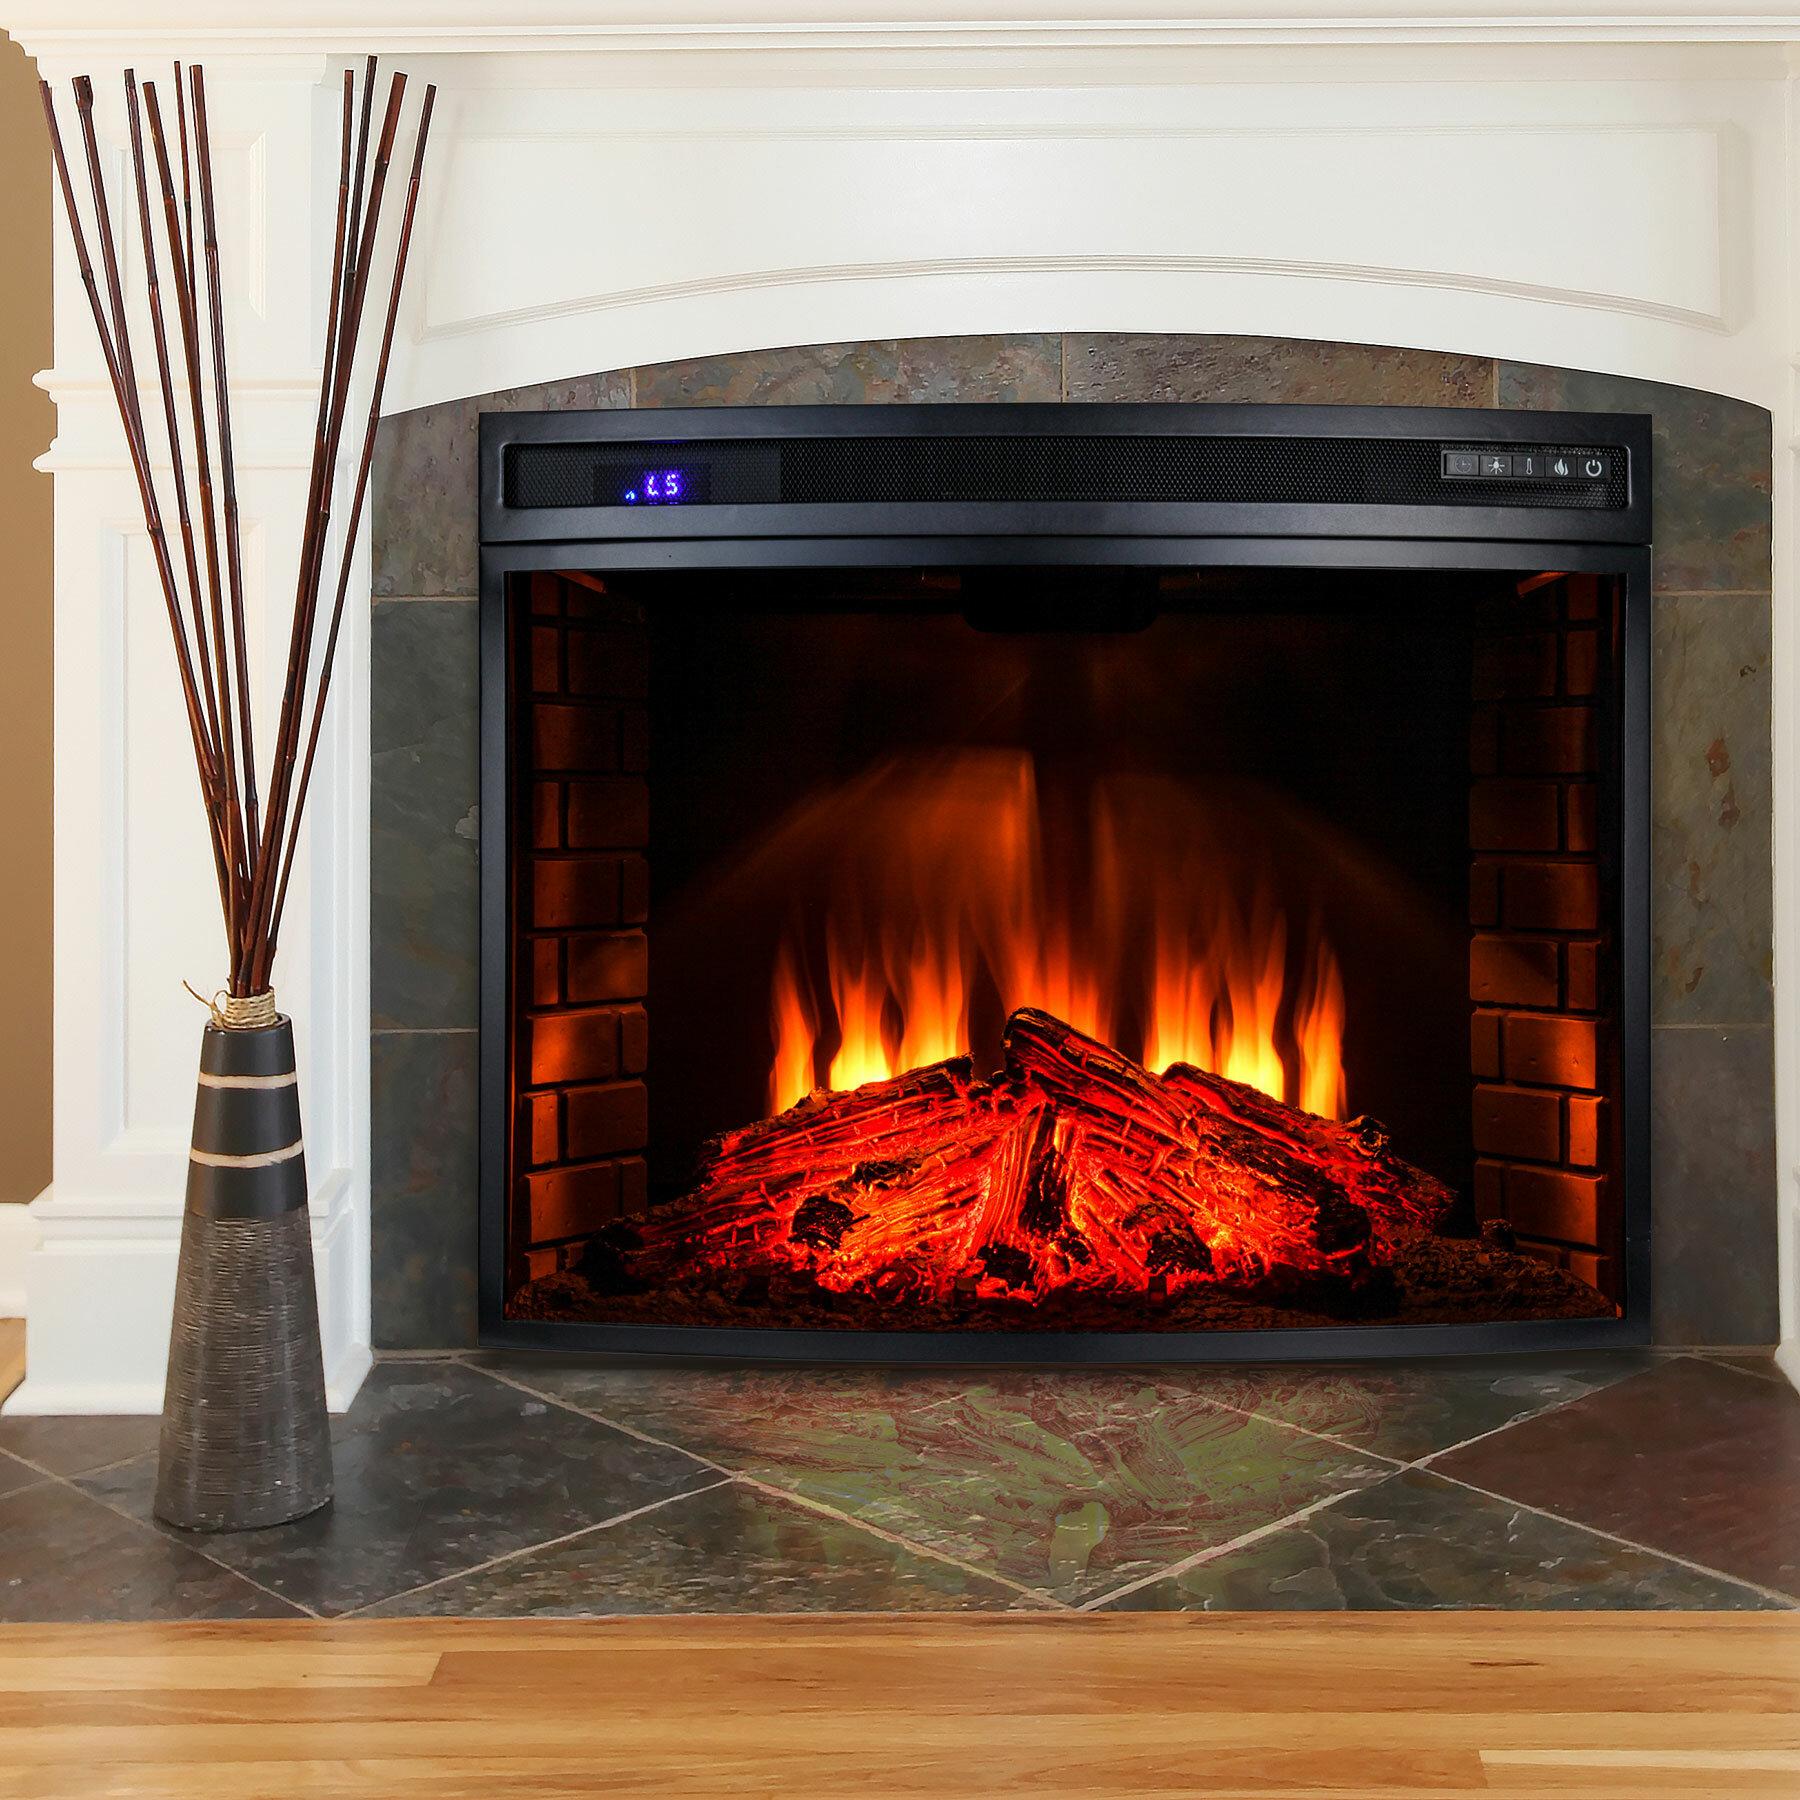 fireplace pdp insert improvement led ca home reviews akdy electric wayfair